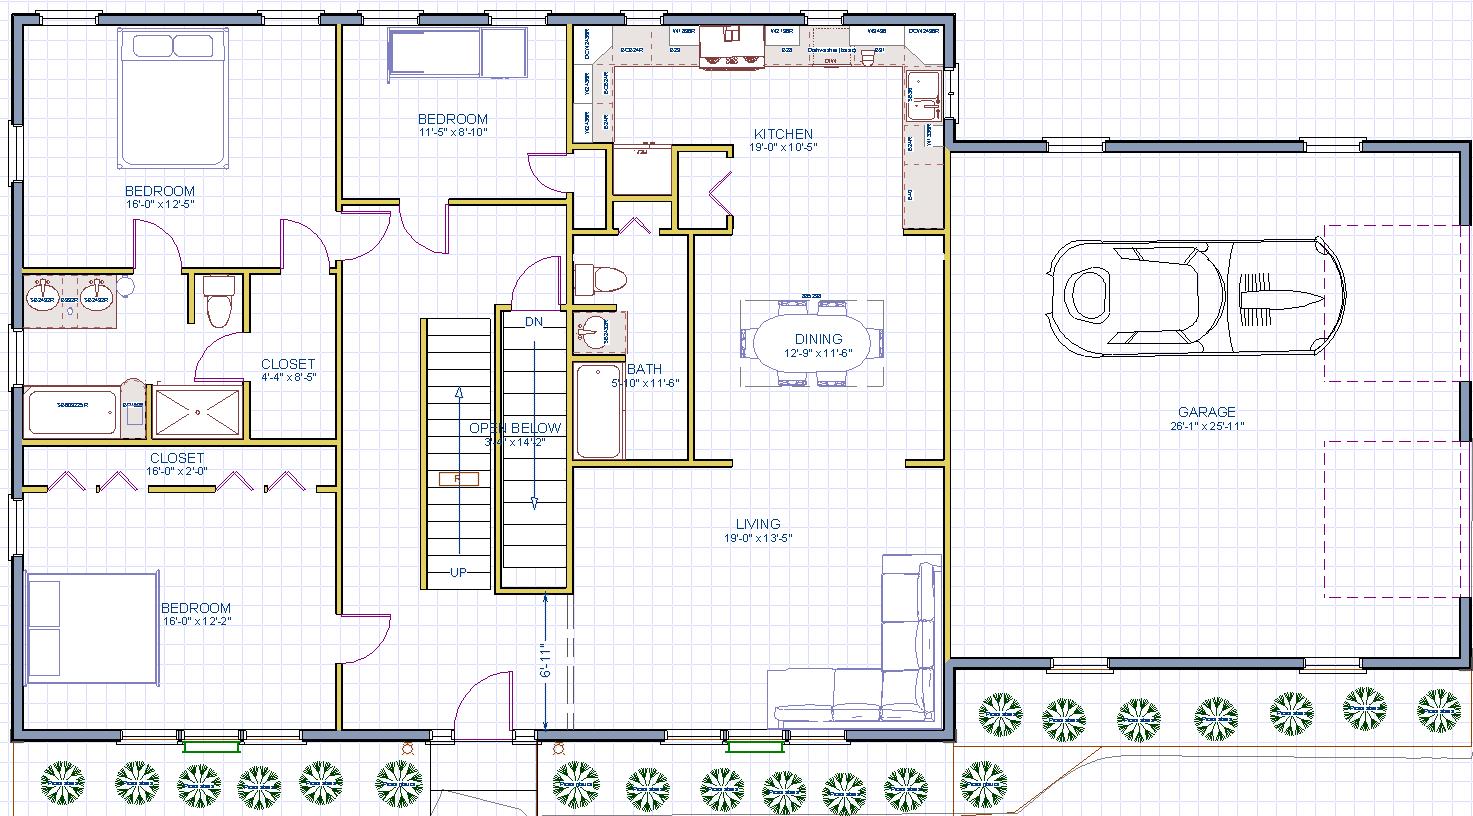 Plan Chalet House Plans 8 Bedroom House Floor Plans Chalet Home Plans